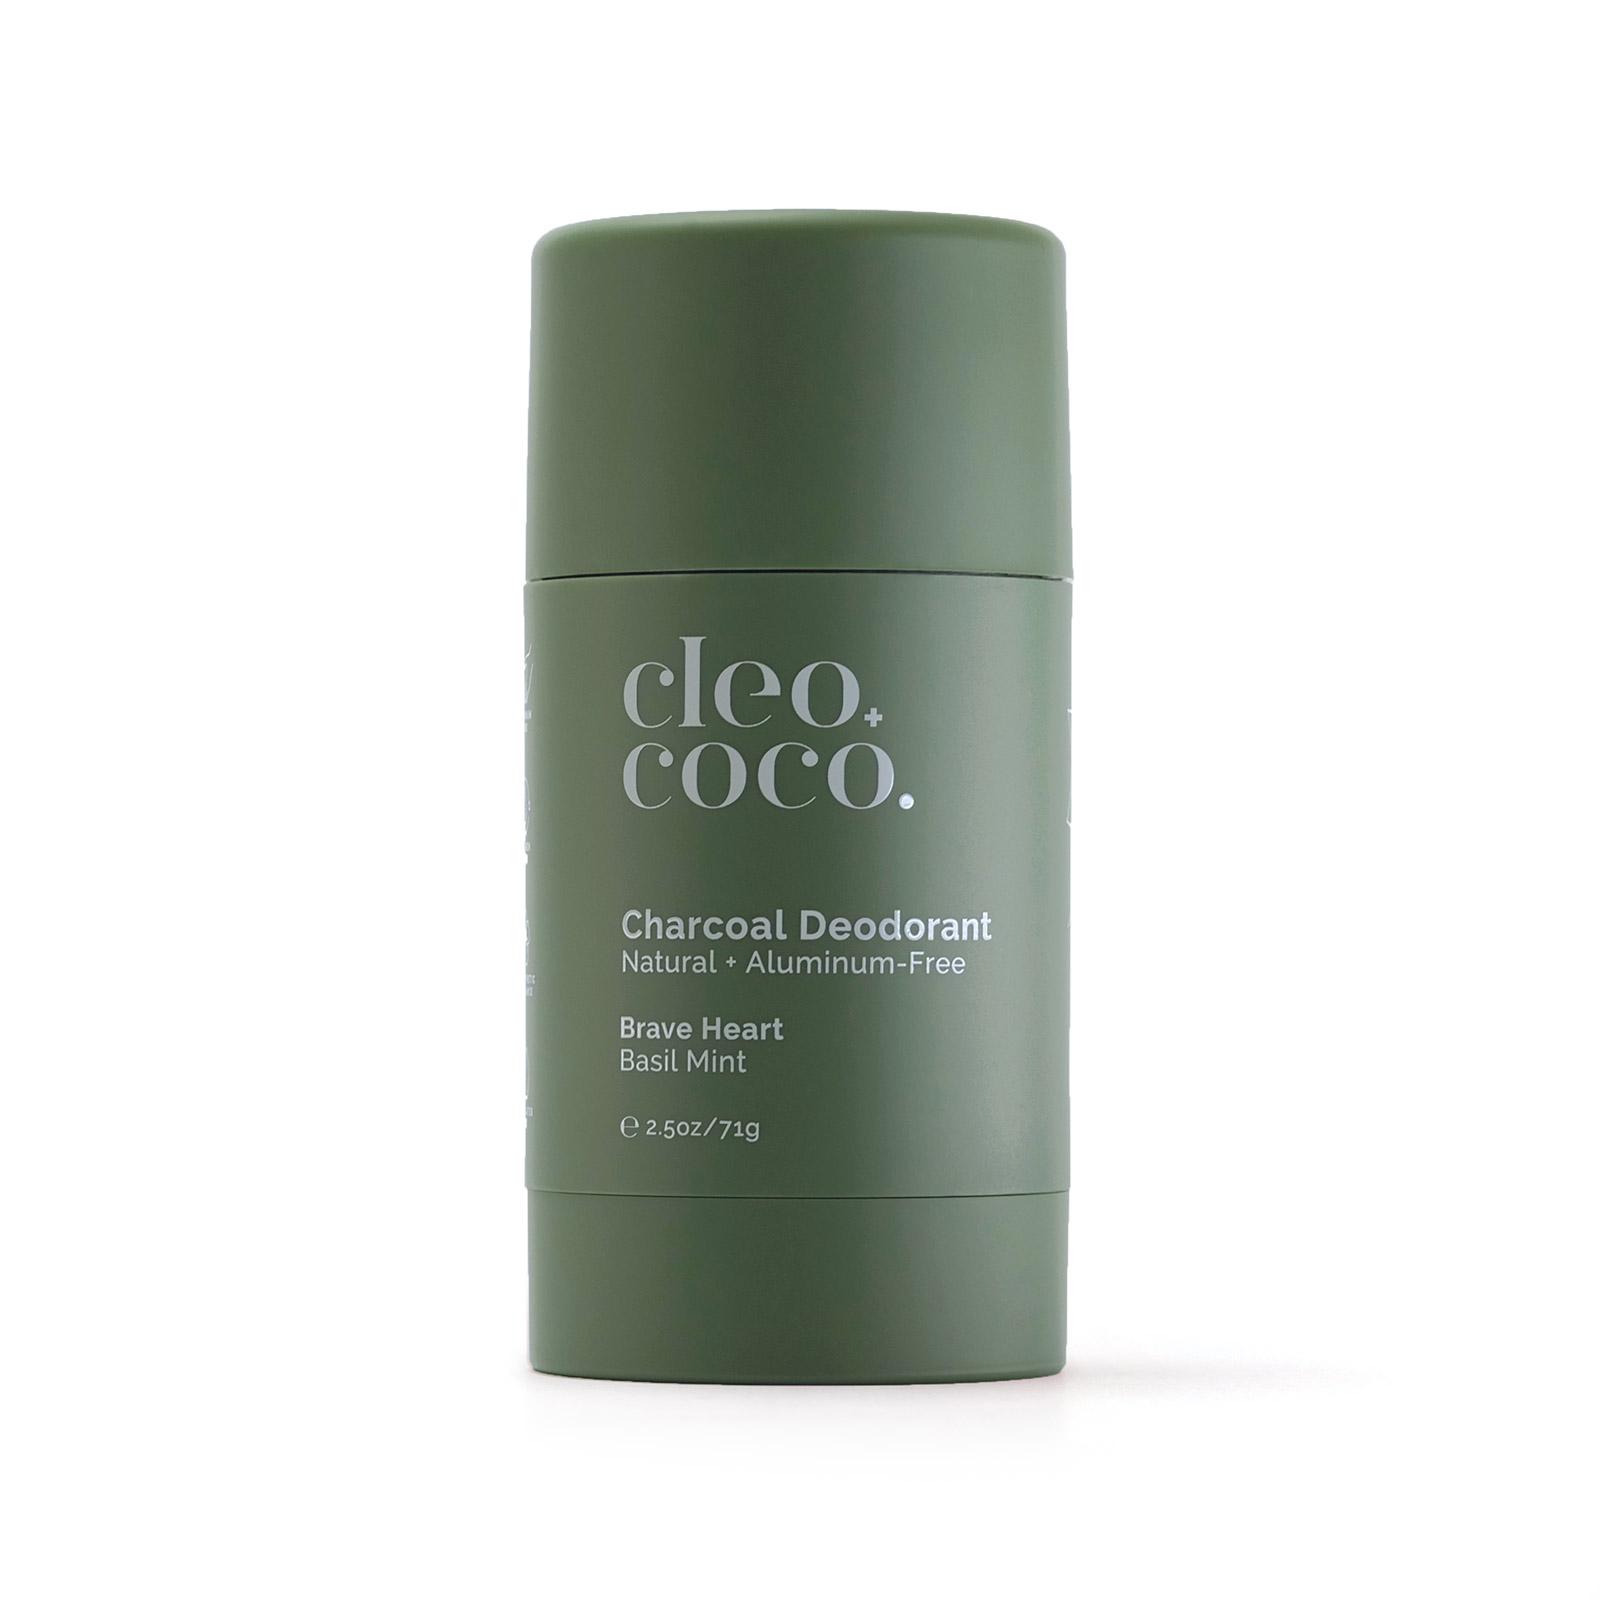 Basil Mint Charcoal Deodorant